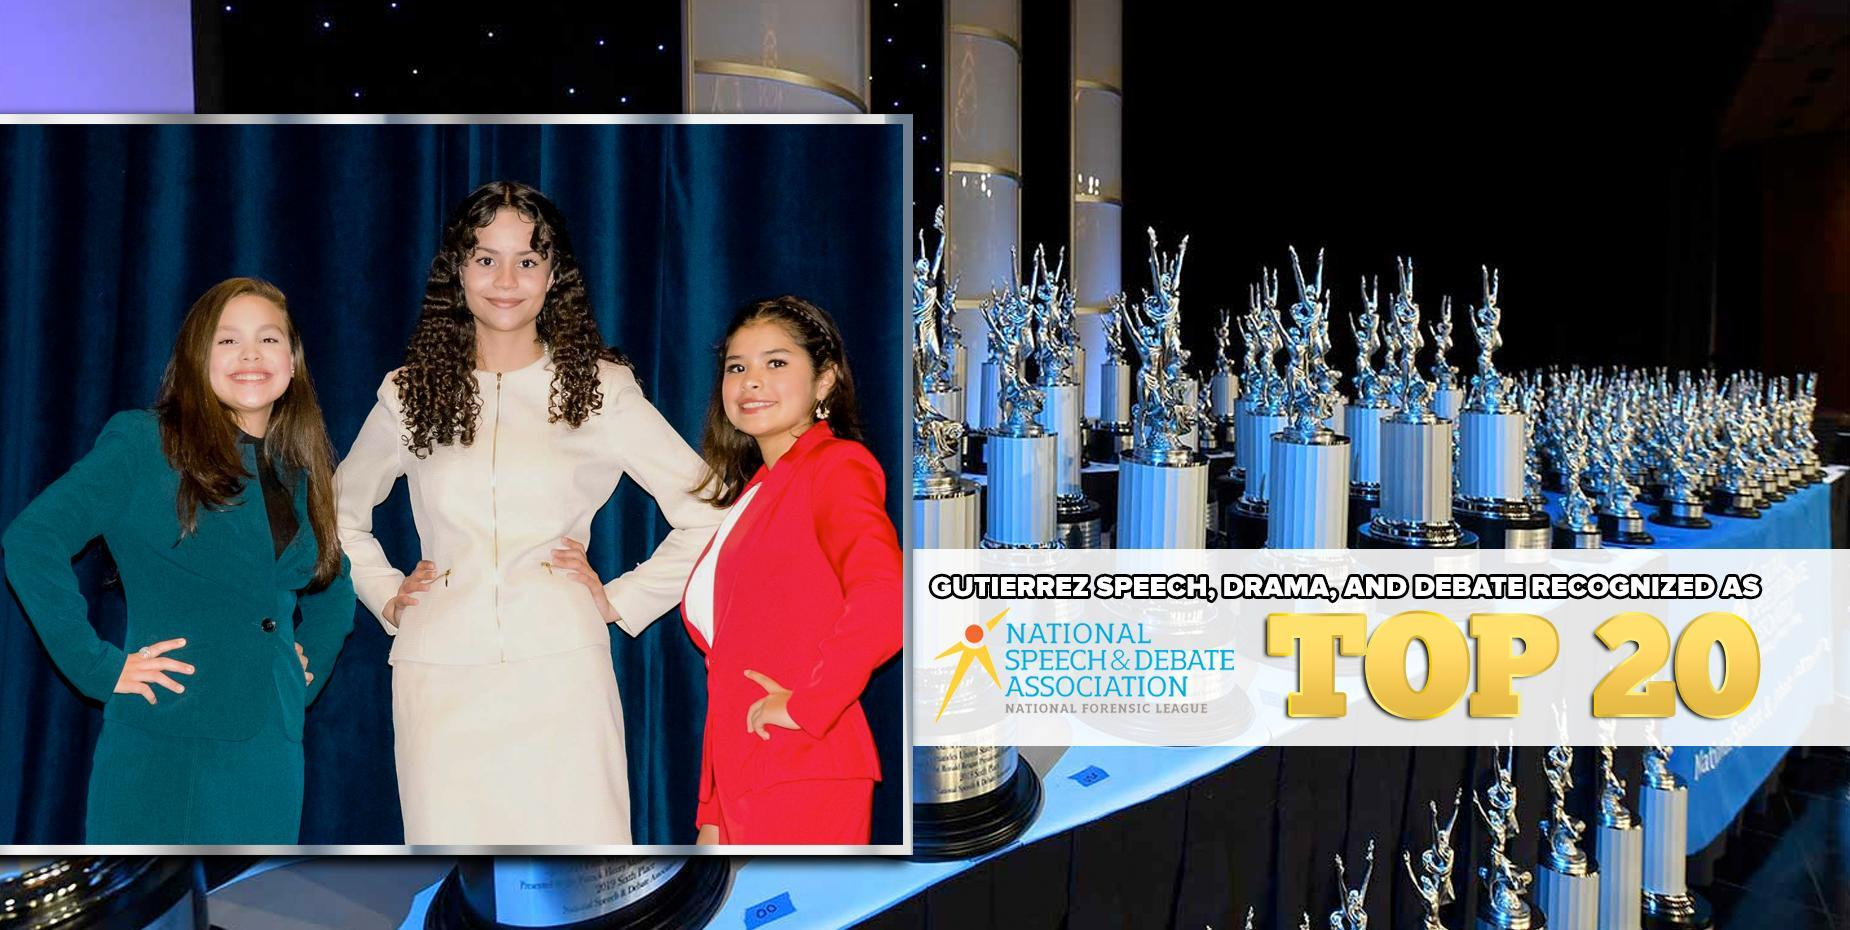 Gutierrez Speech, Drama, and Debate recognized as NSDA Top 20